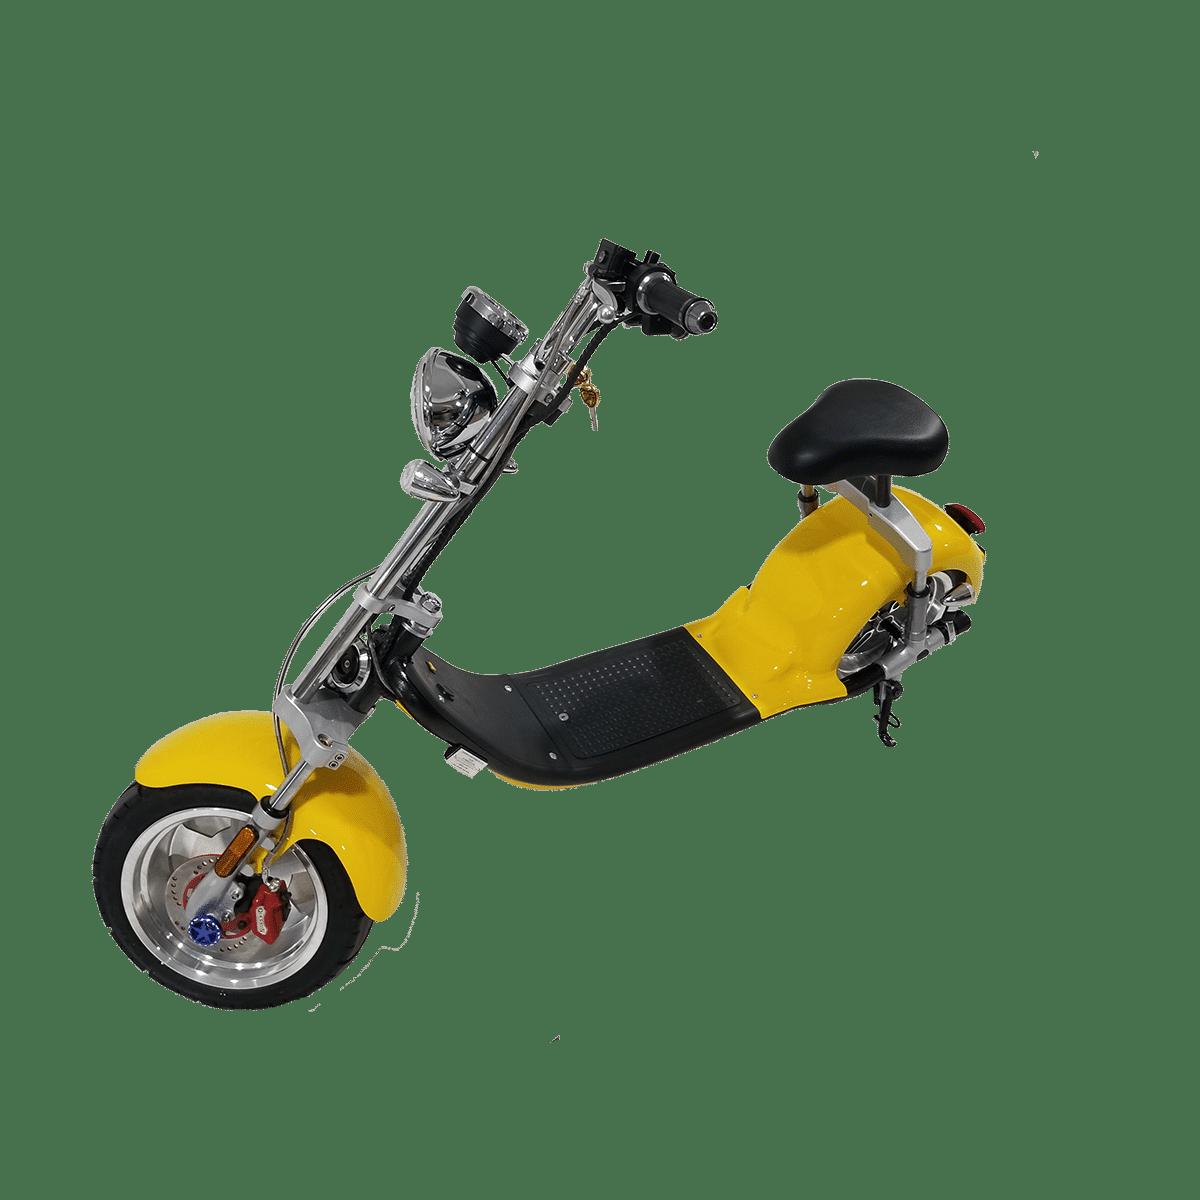 Citycoco Harley Deluxe Jaune avec 1 batterie offerte en plus 7